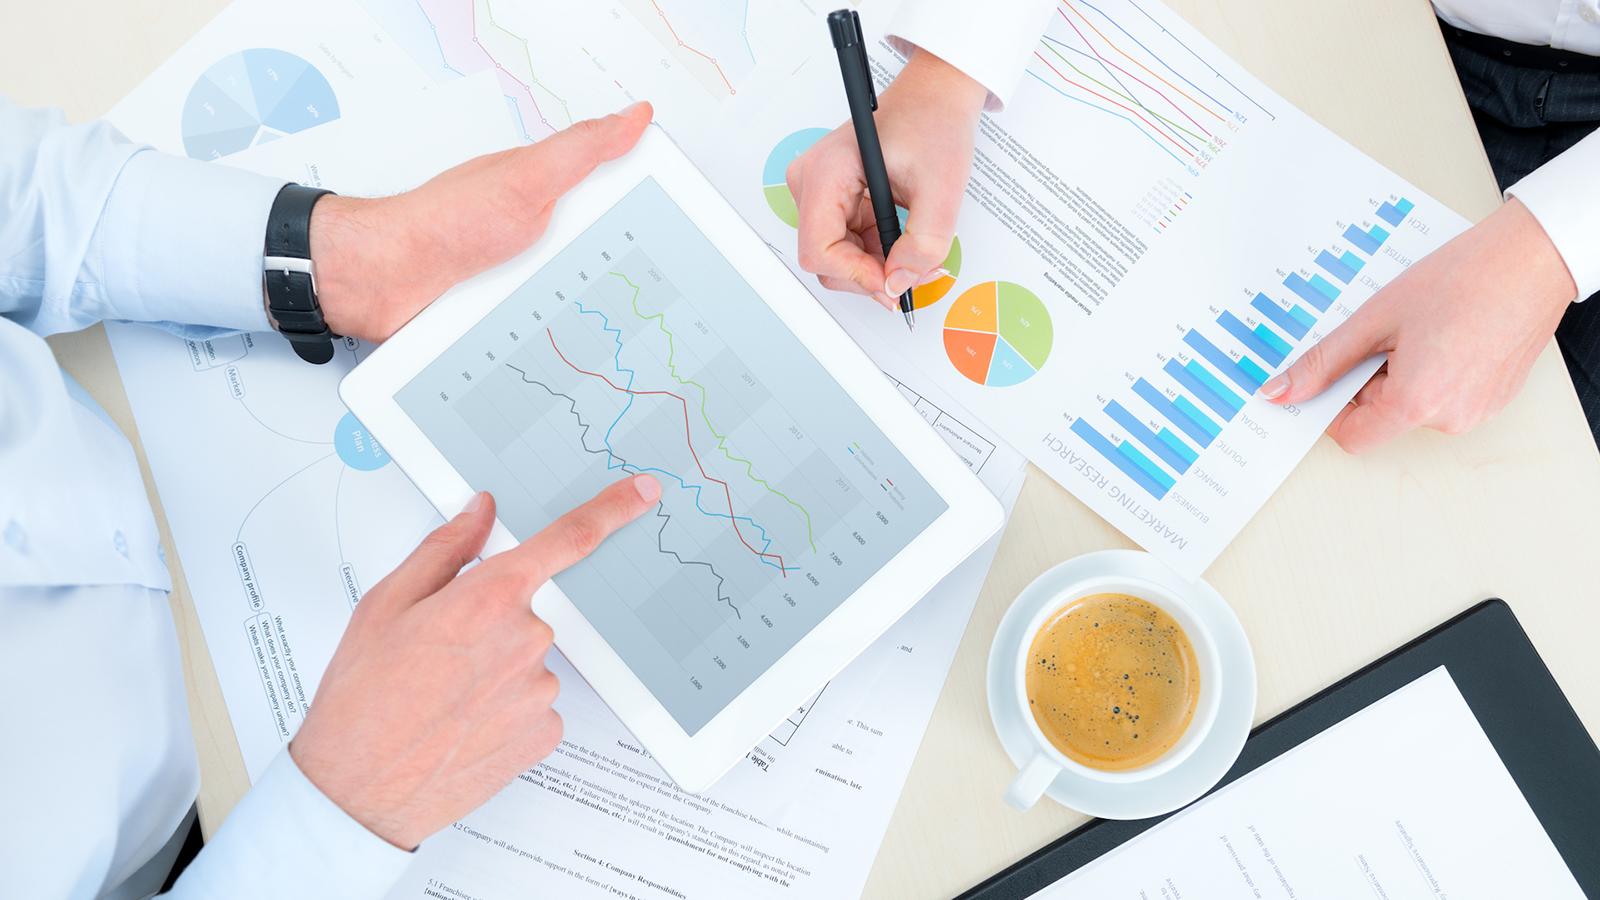 ROI beregning - Return on investment